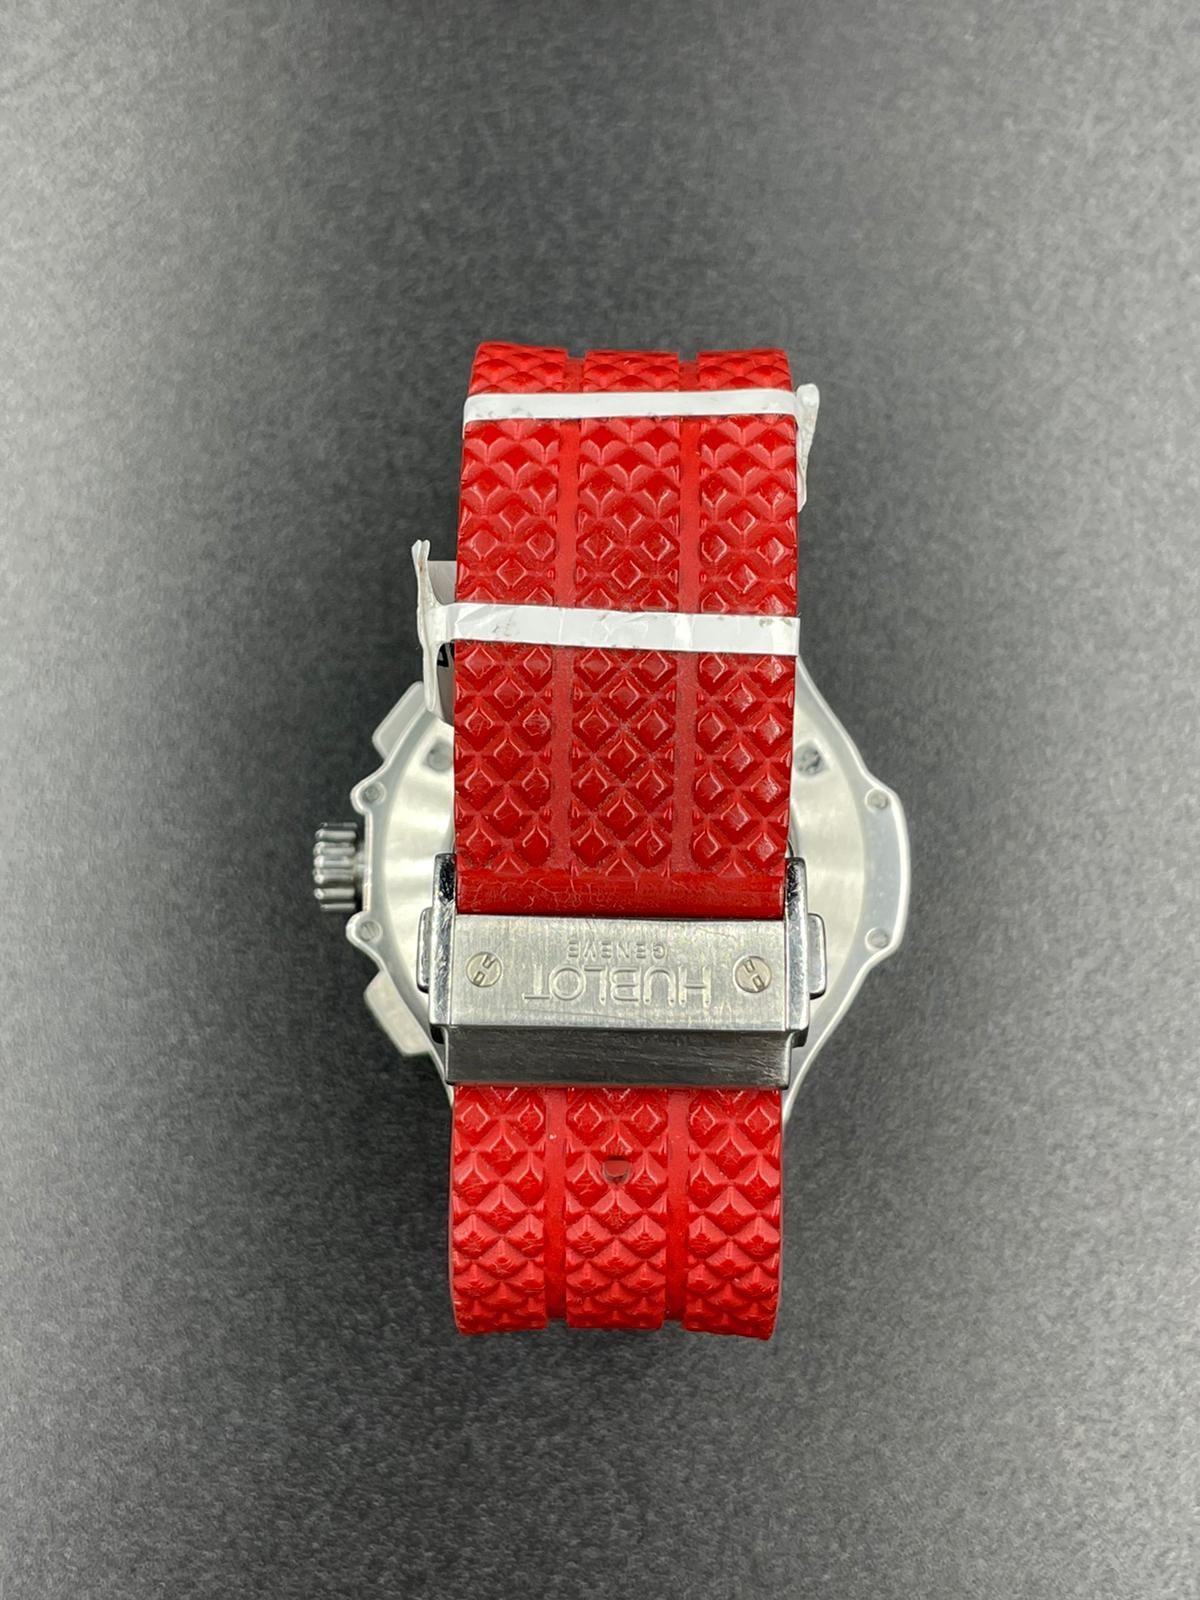 Hublot Big Bang chronometer watch with black face and original diamond dial - Image 5 of 5